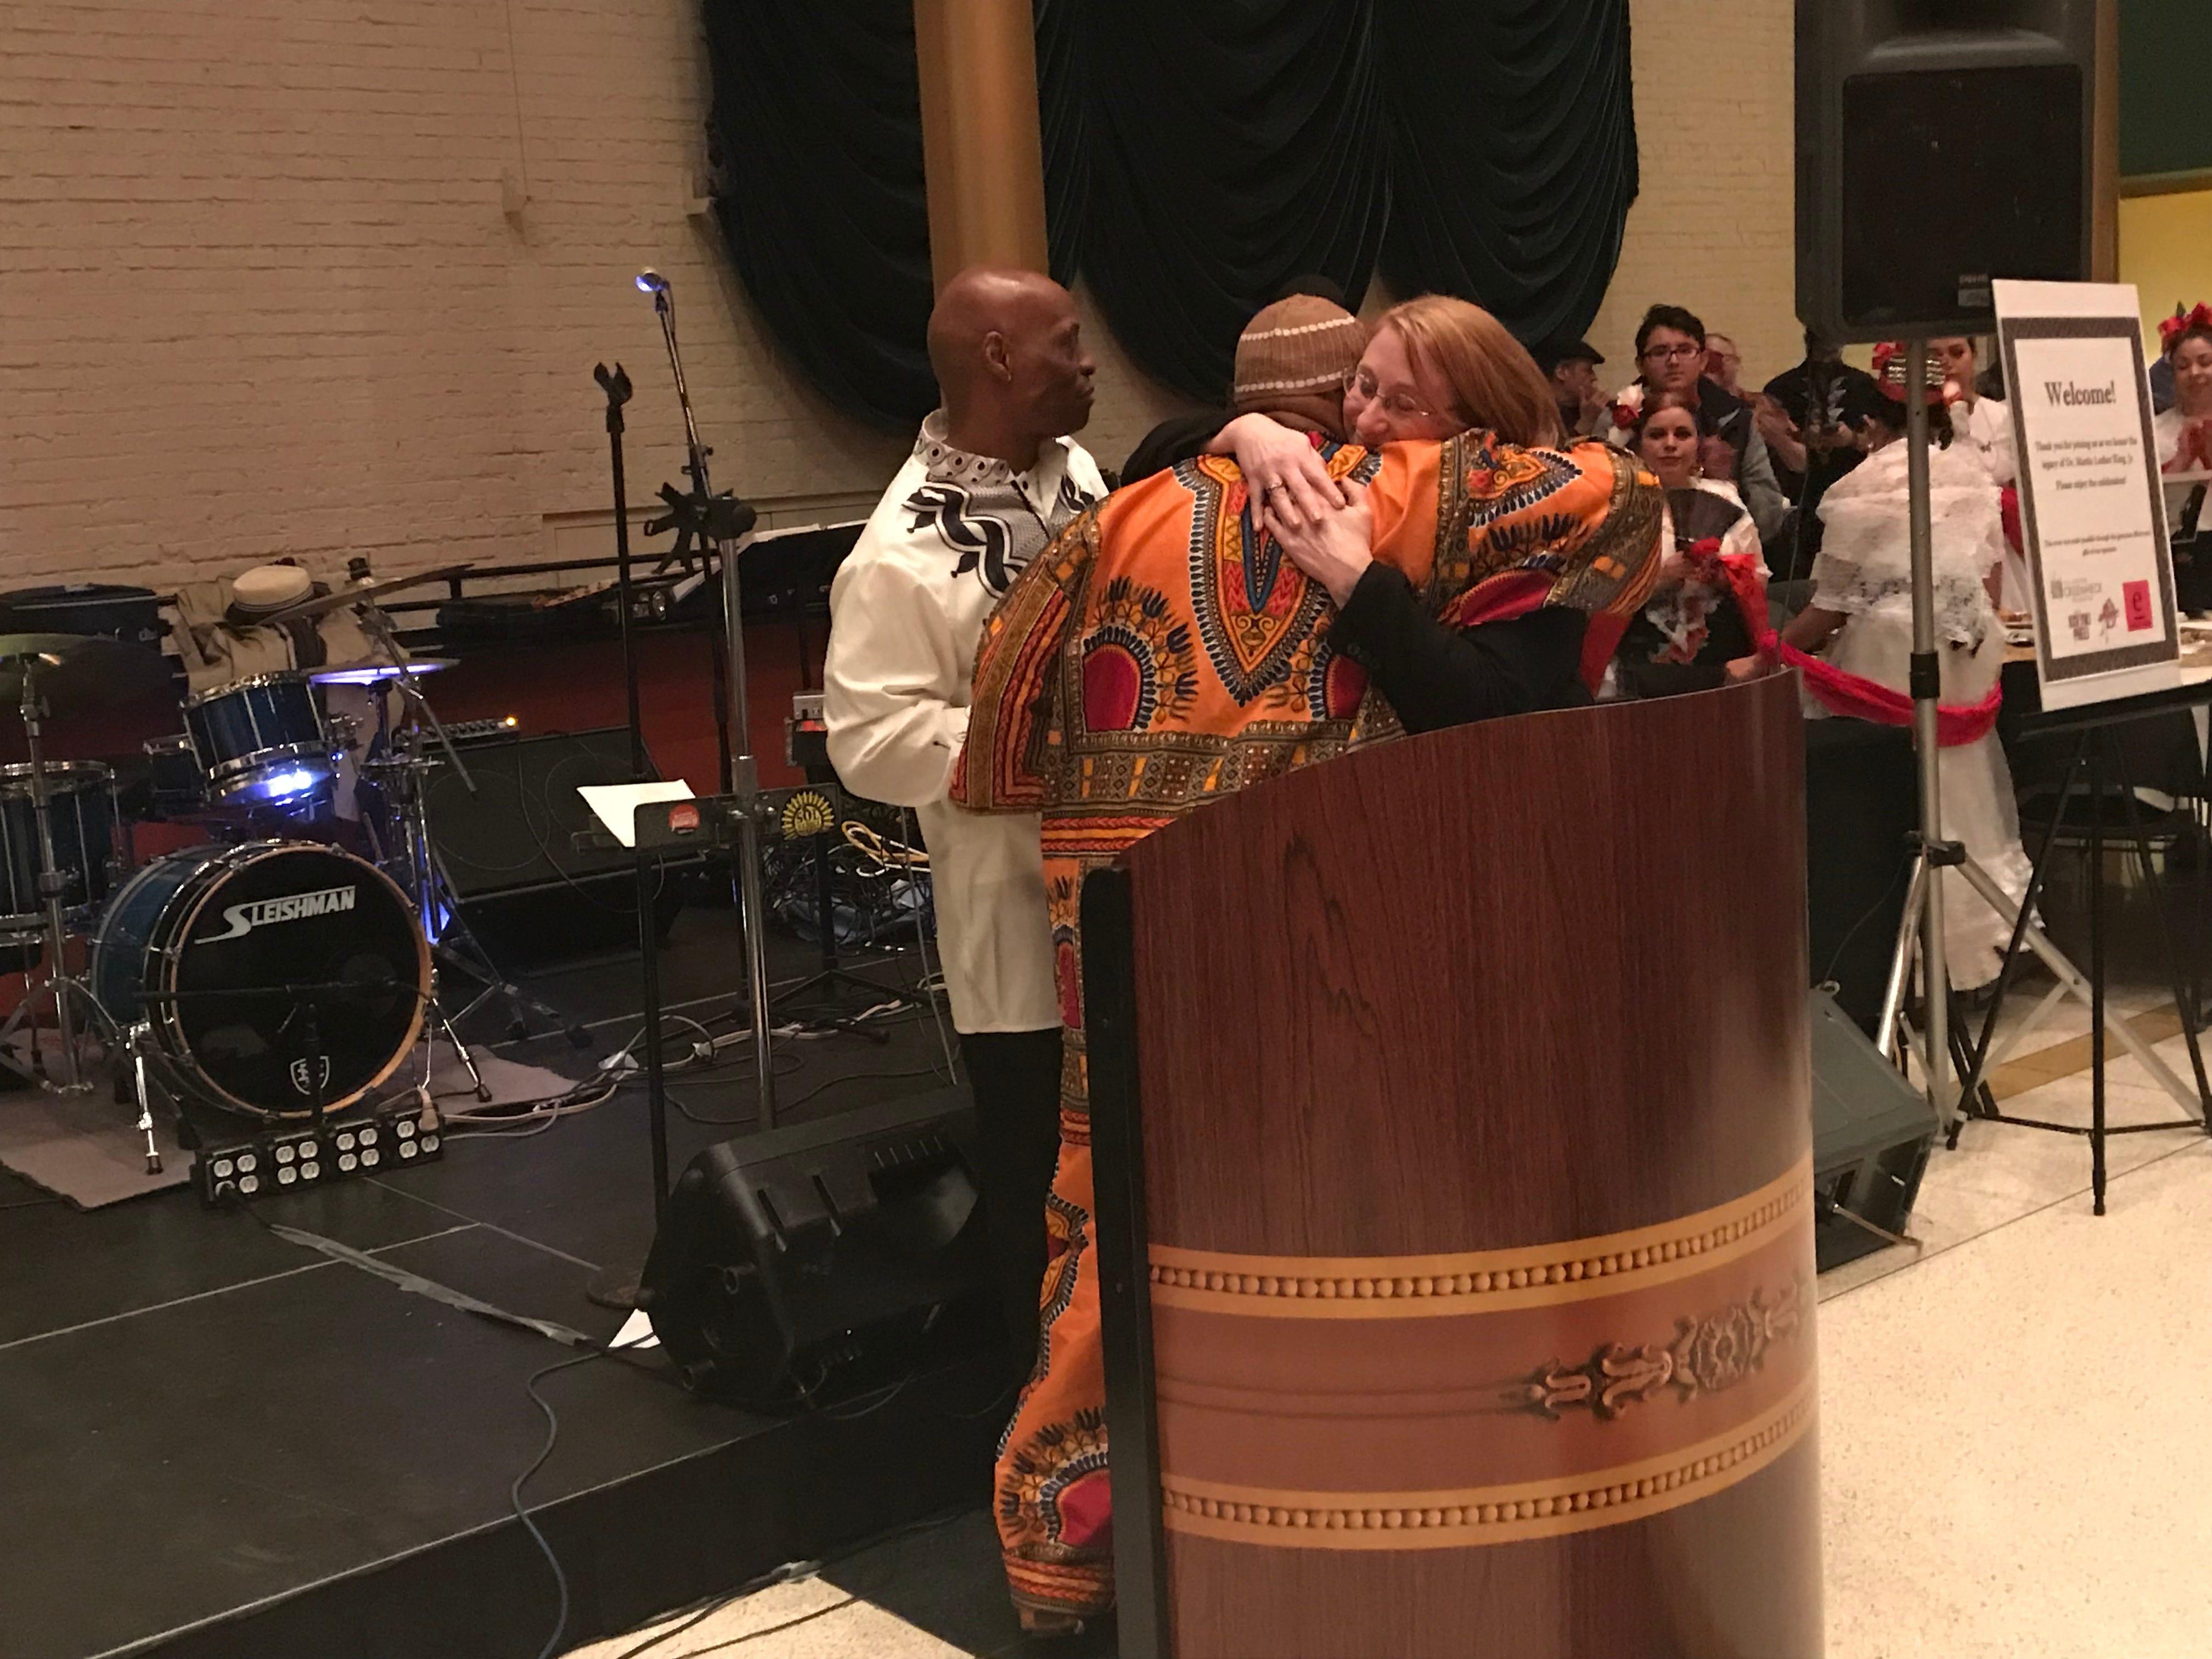 David Stuart hugs social justice award winner Kate Hephner at the MLK Day celebration at the Grand Theater in Wausau.